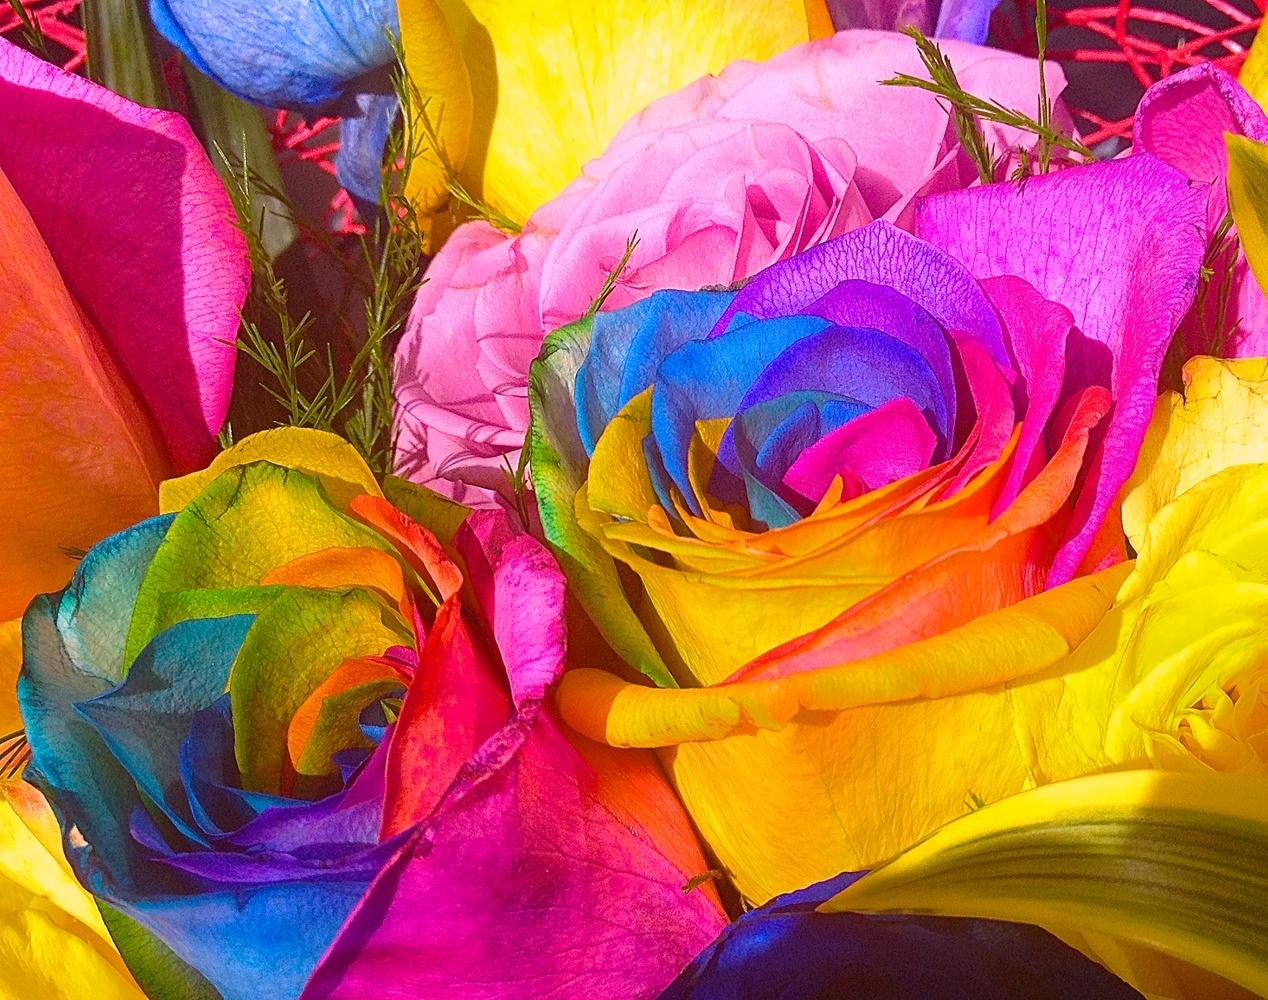 Rainbow Petals by Jessie Jocelyne